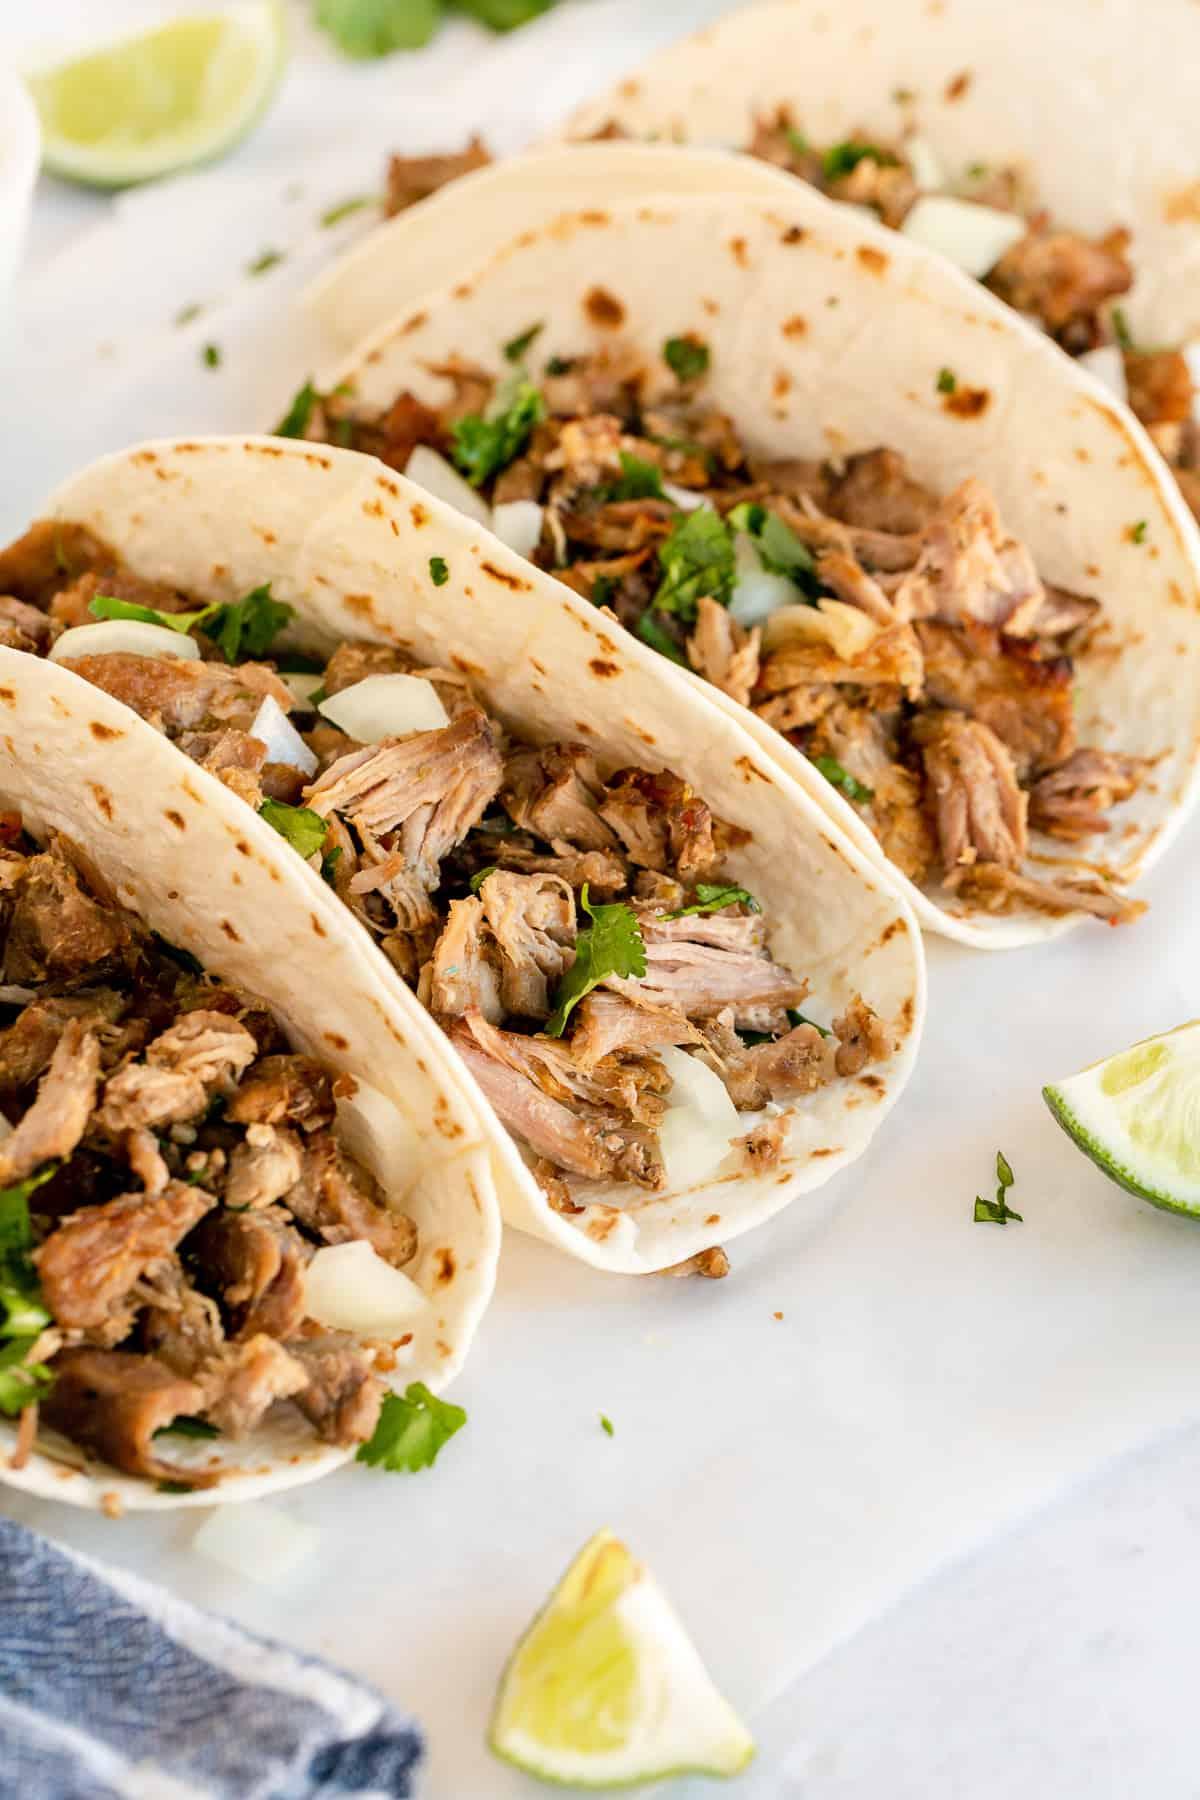 Three carnitas tacos on a platter.